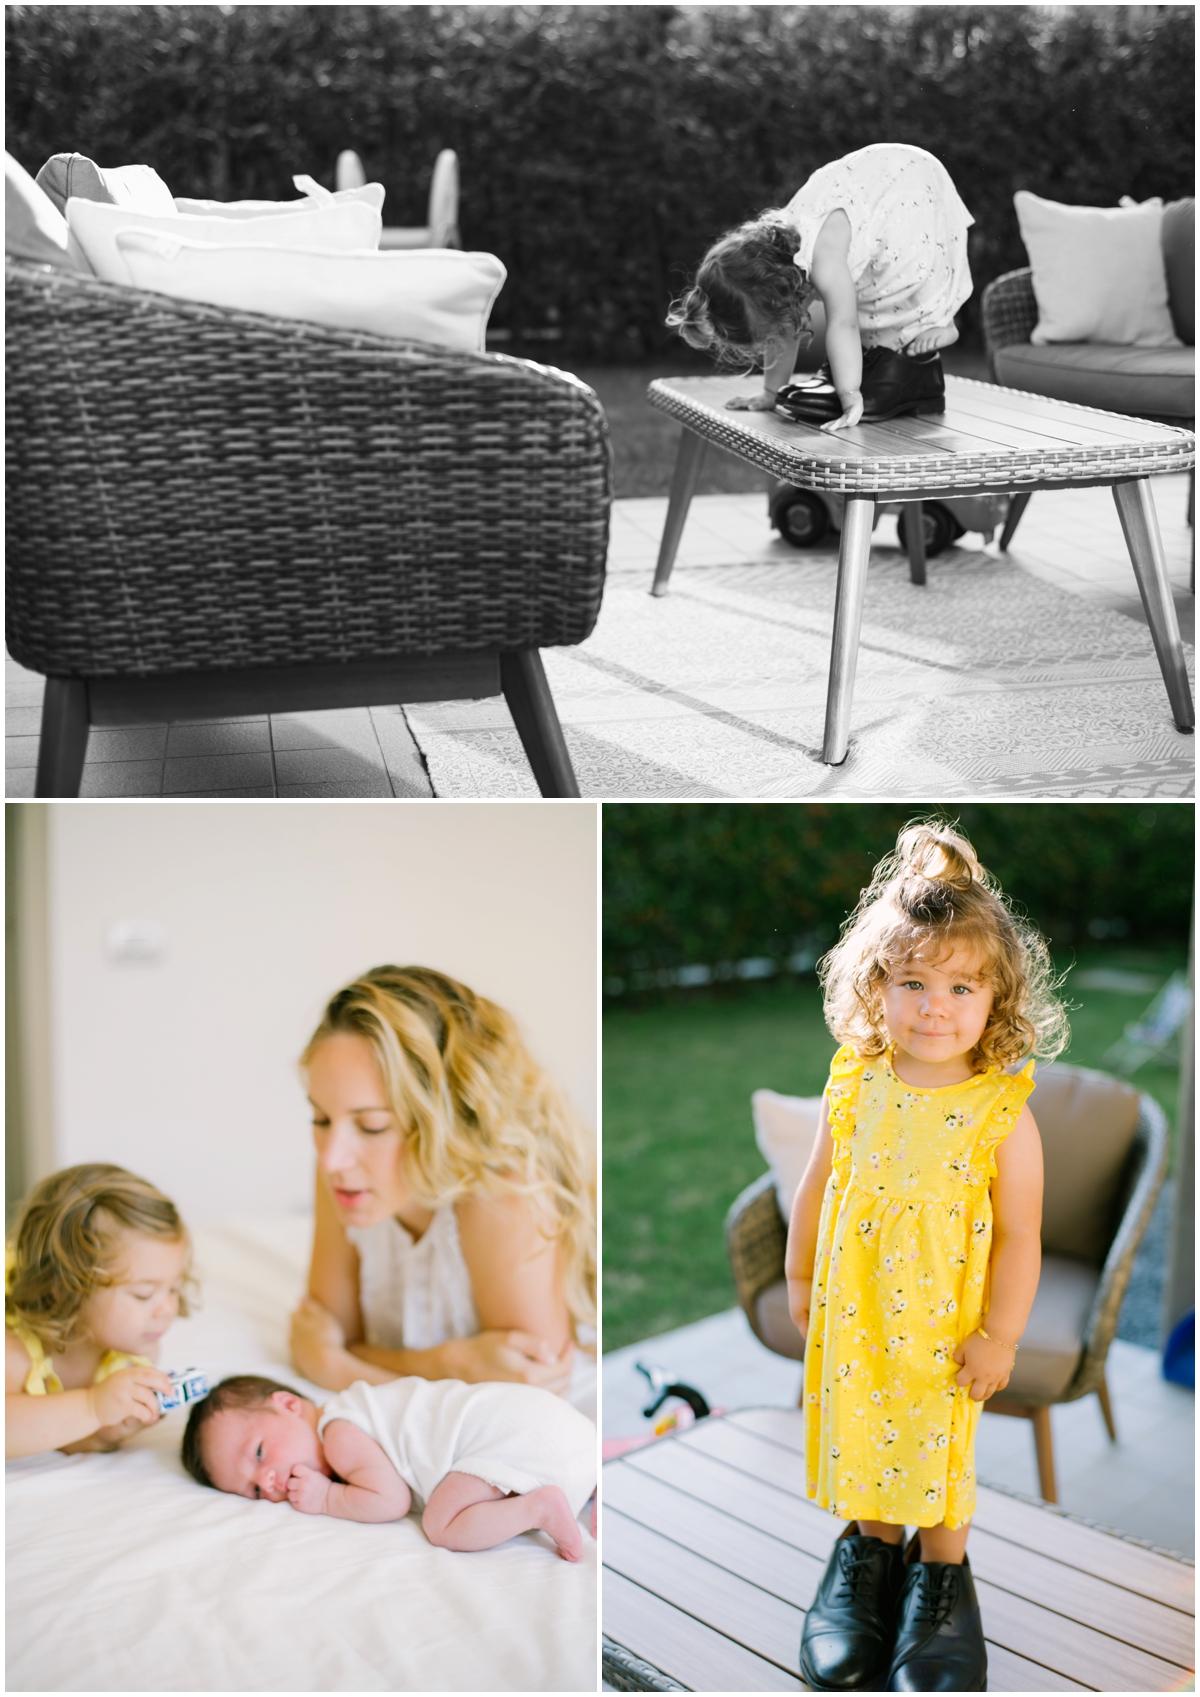 Alea Lovely Family Portraits_0017.jpg